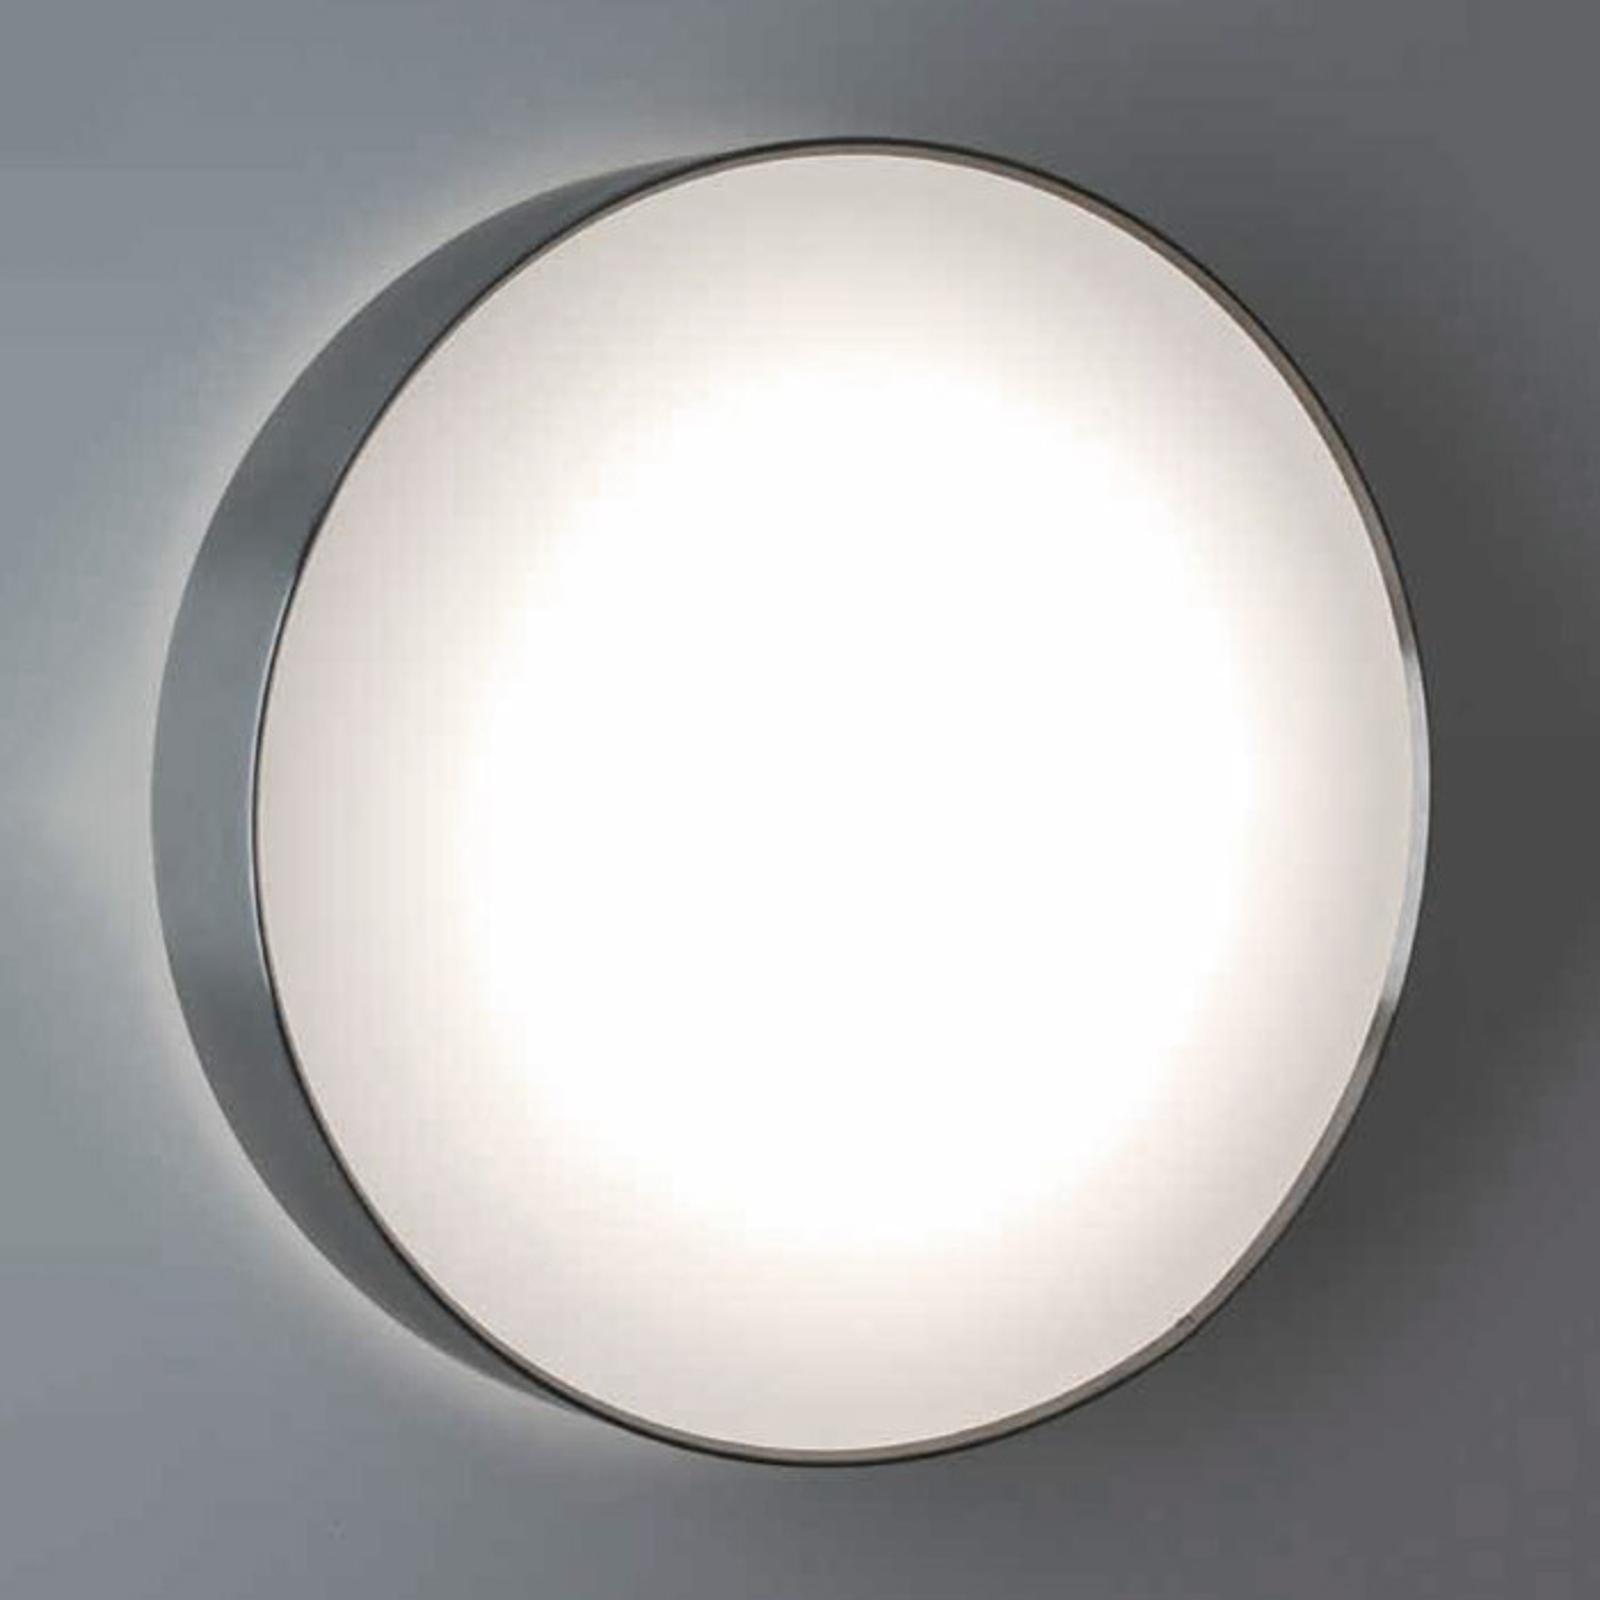 Lampada di acciaio SUN 4 LED, 8W 4K